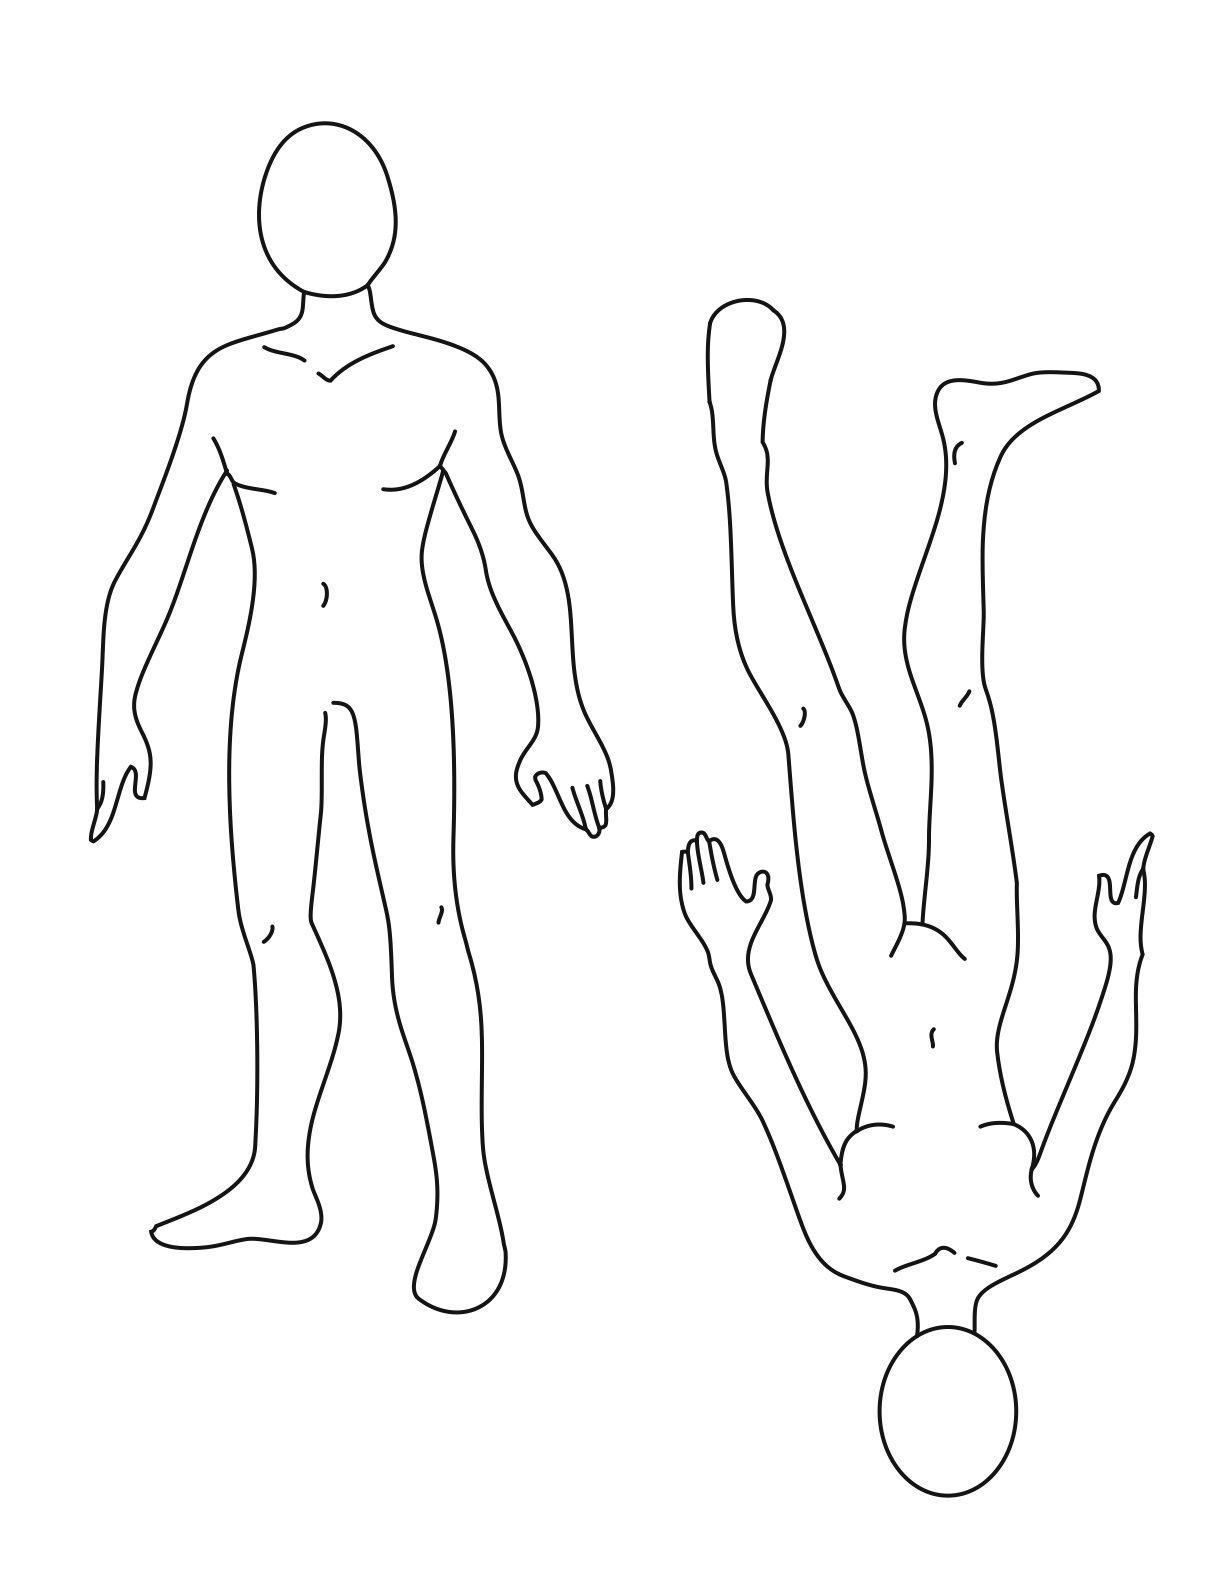 Pix For Gt Cartoon Female Body Outline